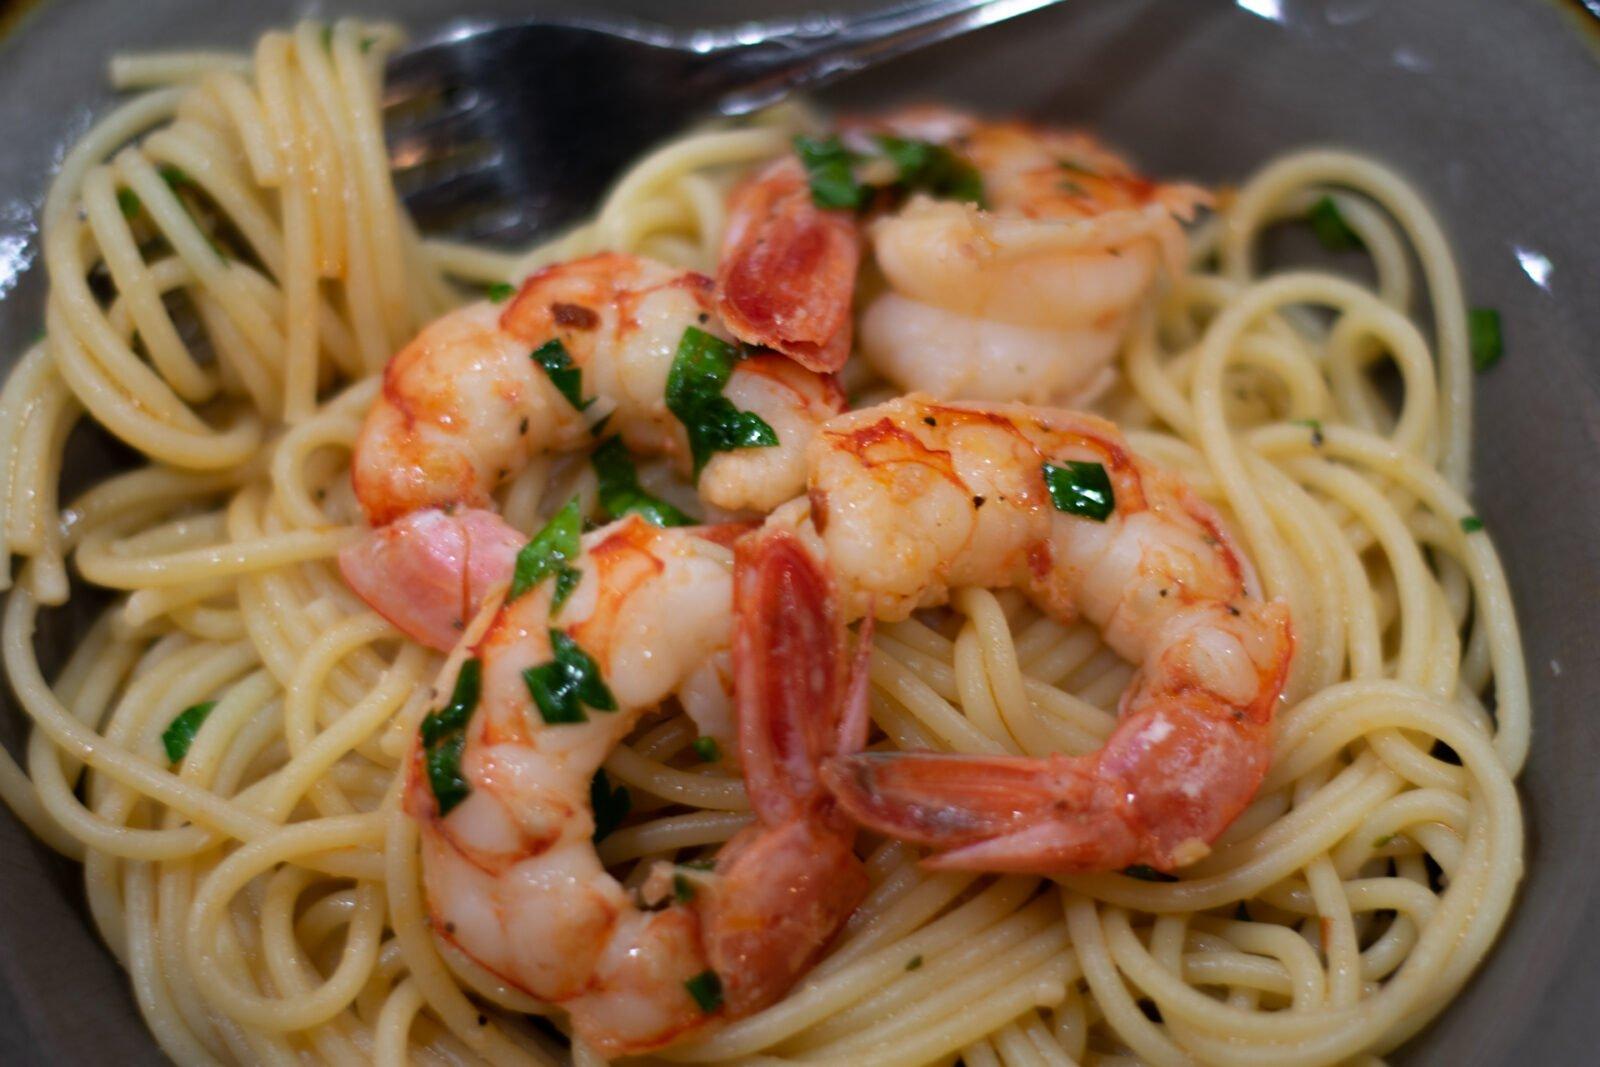 shrimp scampi ready to eat